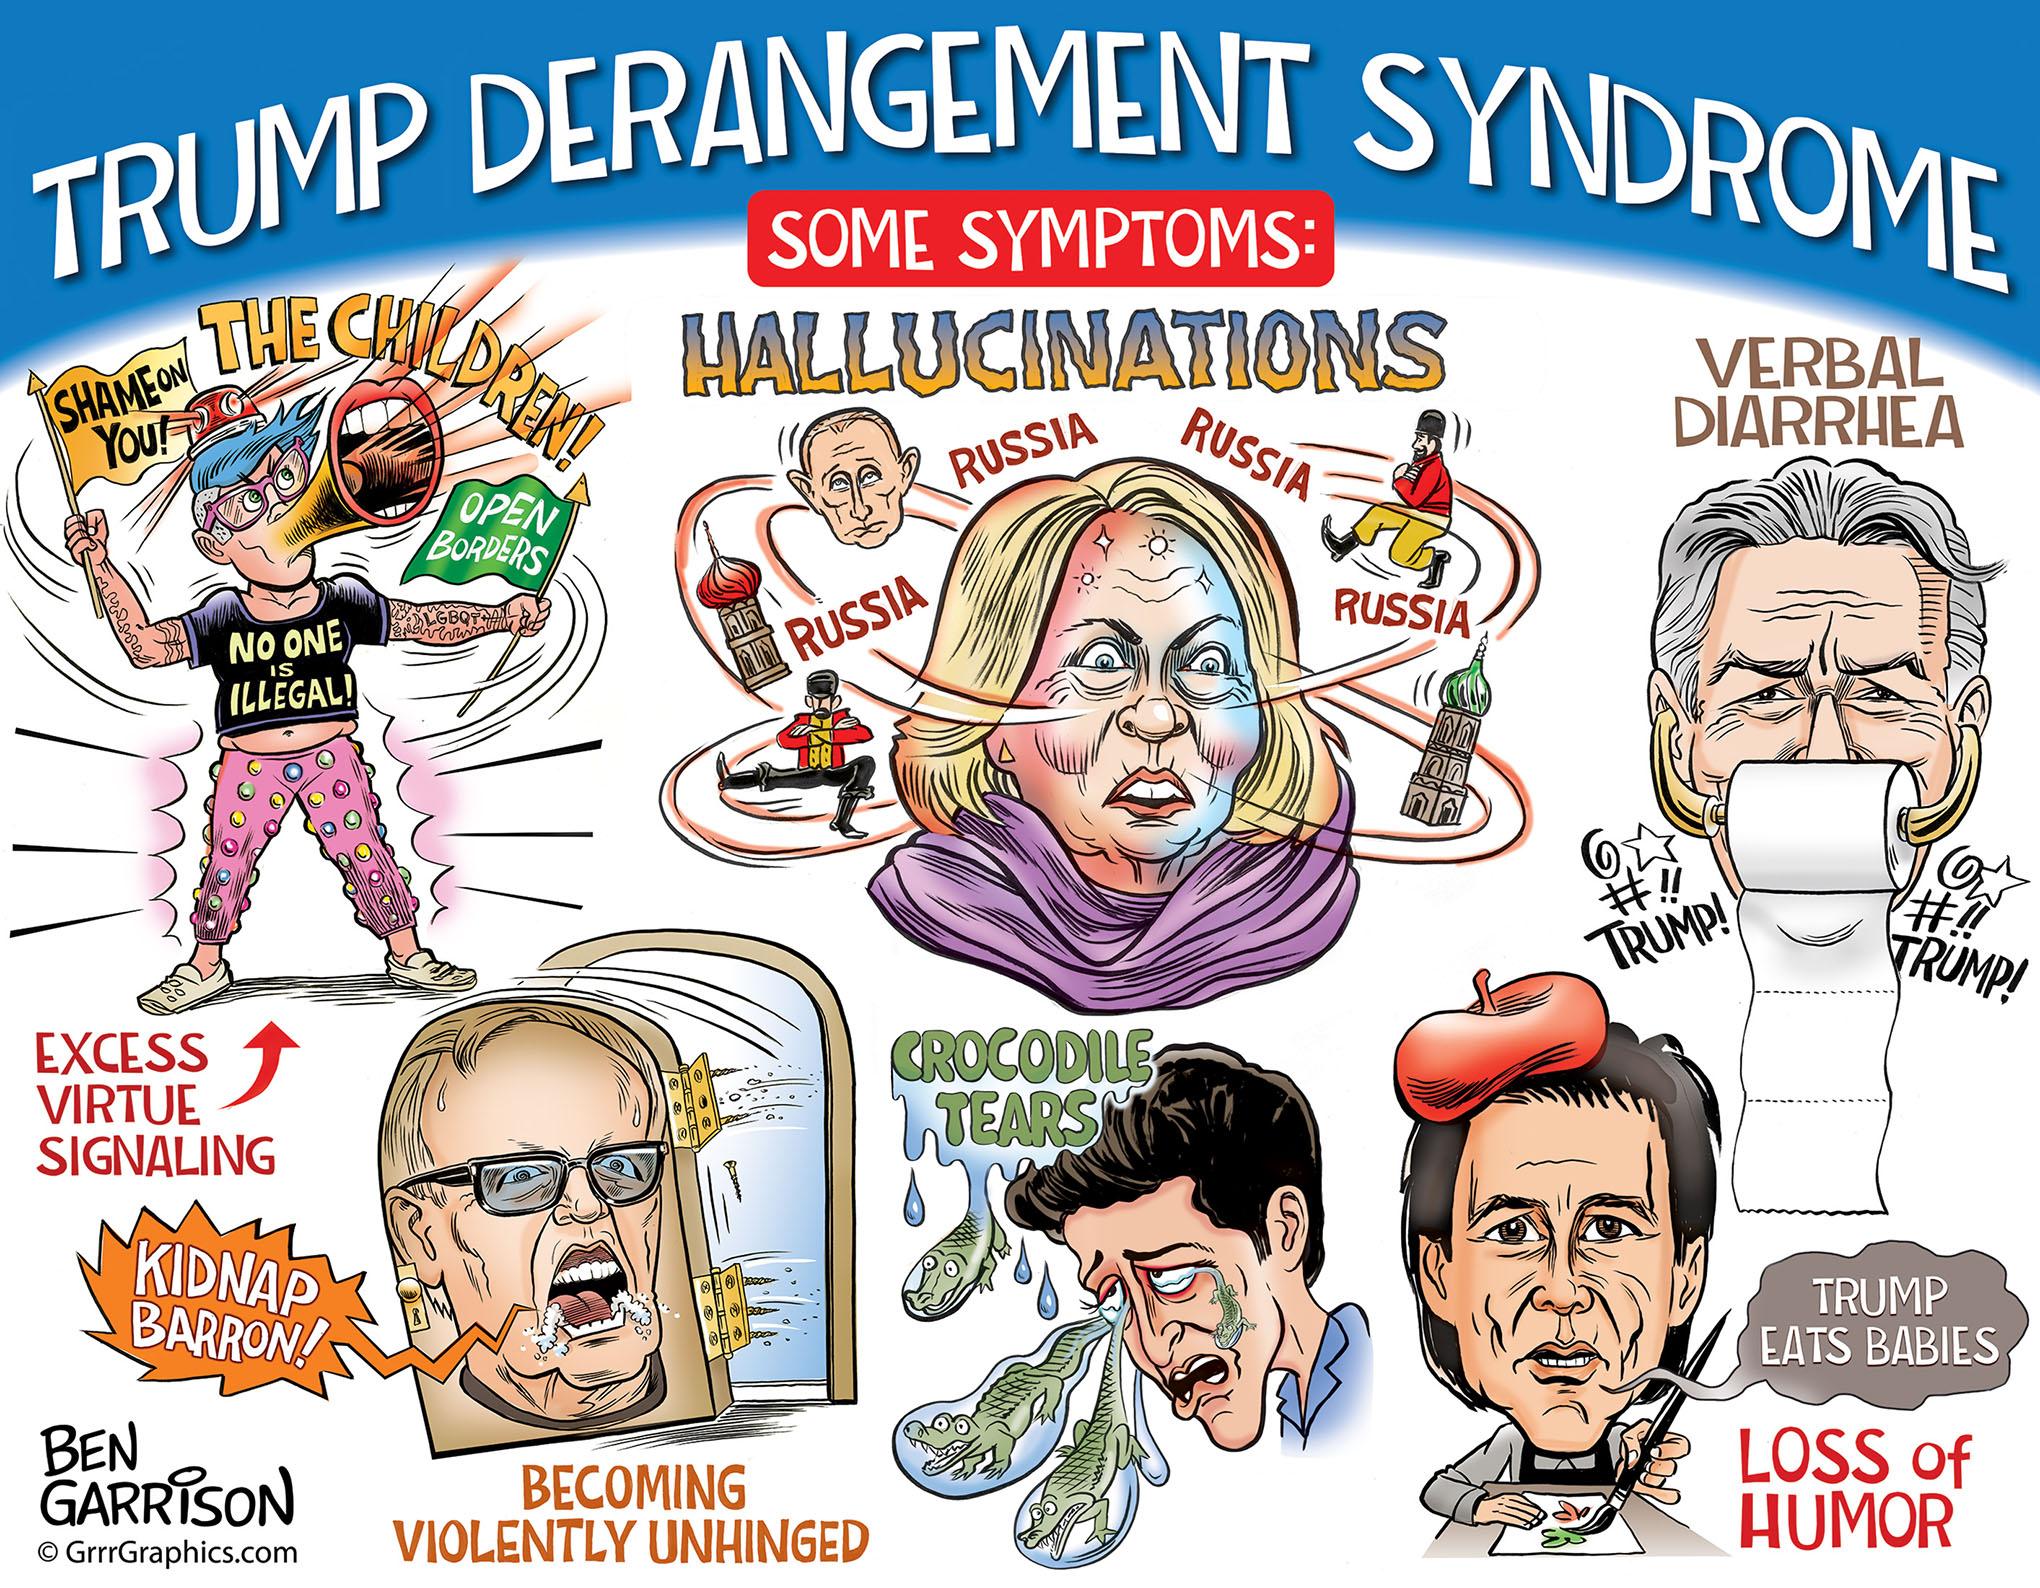 http://grrrgraphics.com/wp-content/uploads/2018/06/trump_derangement_syndrome.jpg